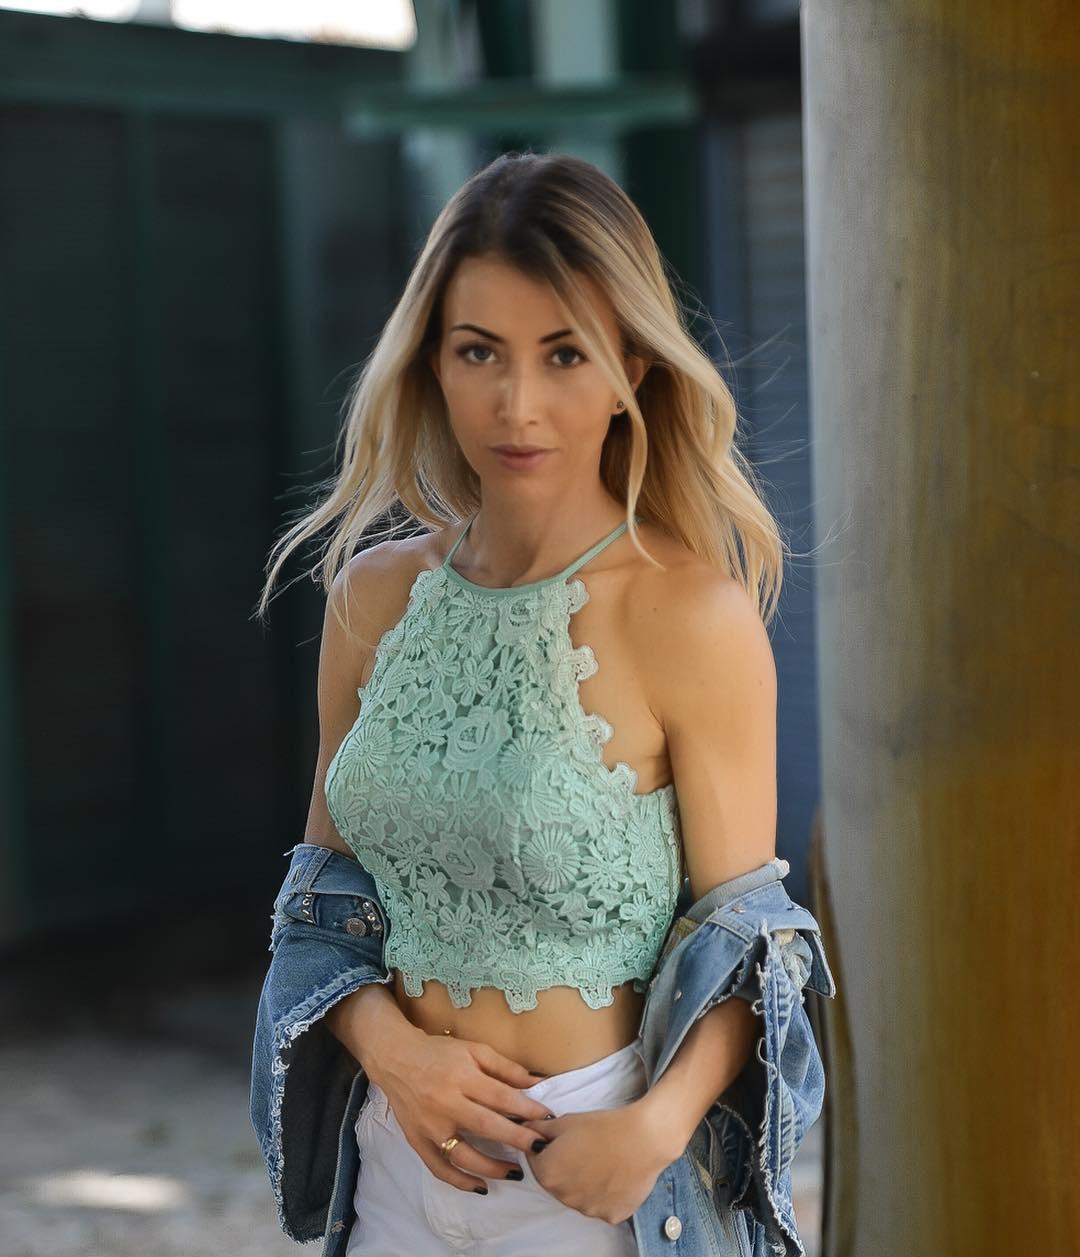 Laura Figueiredo 1 Laura Figueiredo Surpreende Seguidores Em Foto Sensual